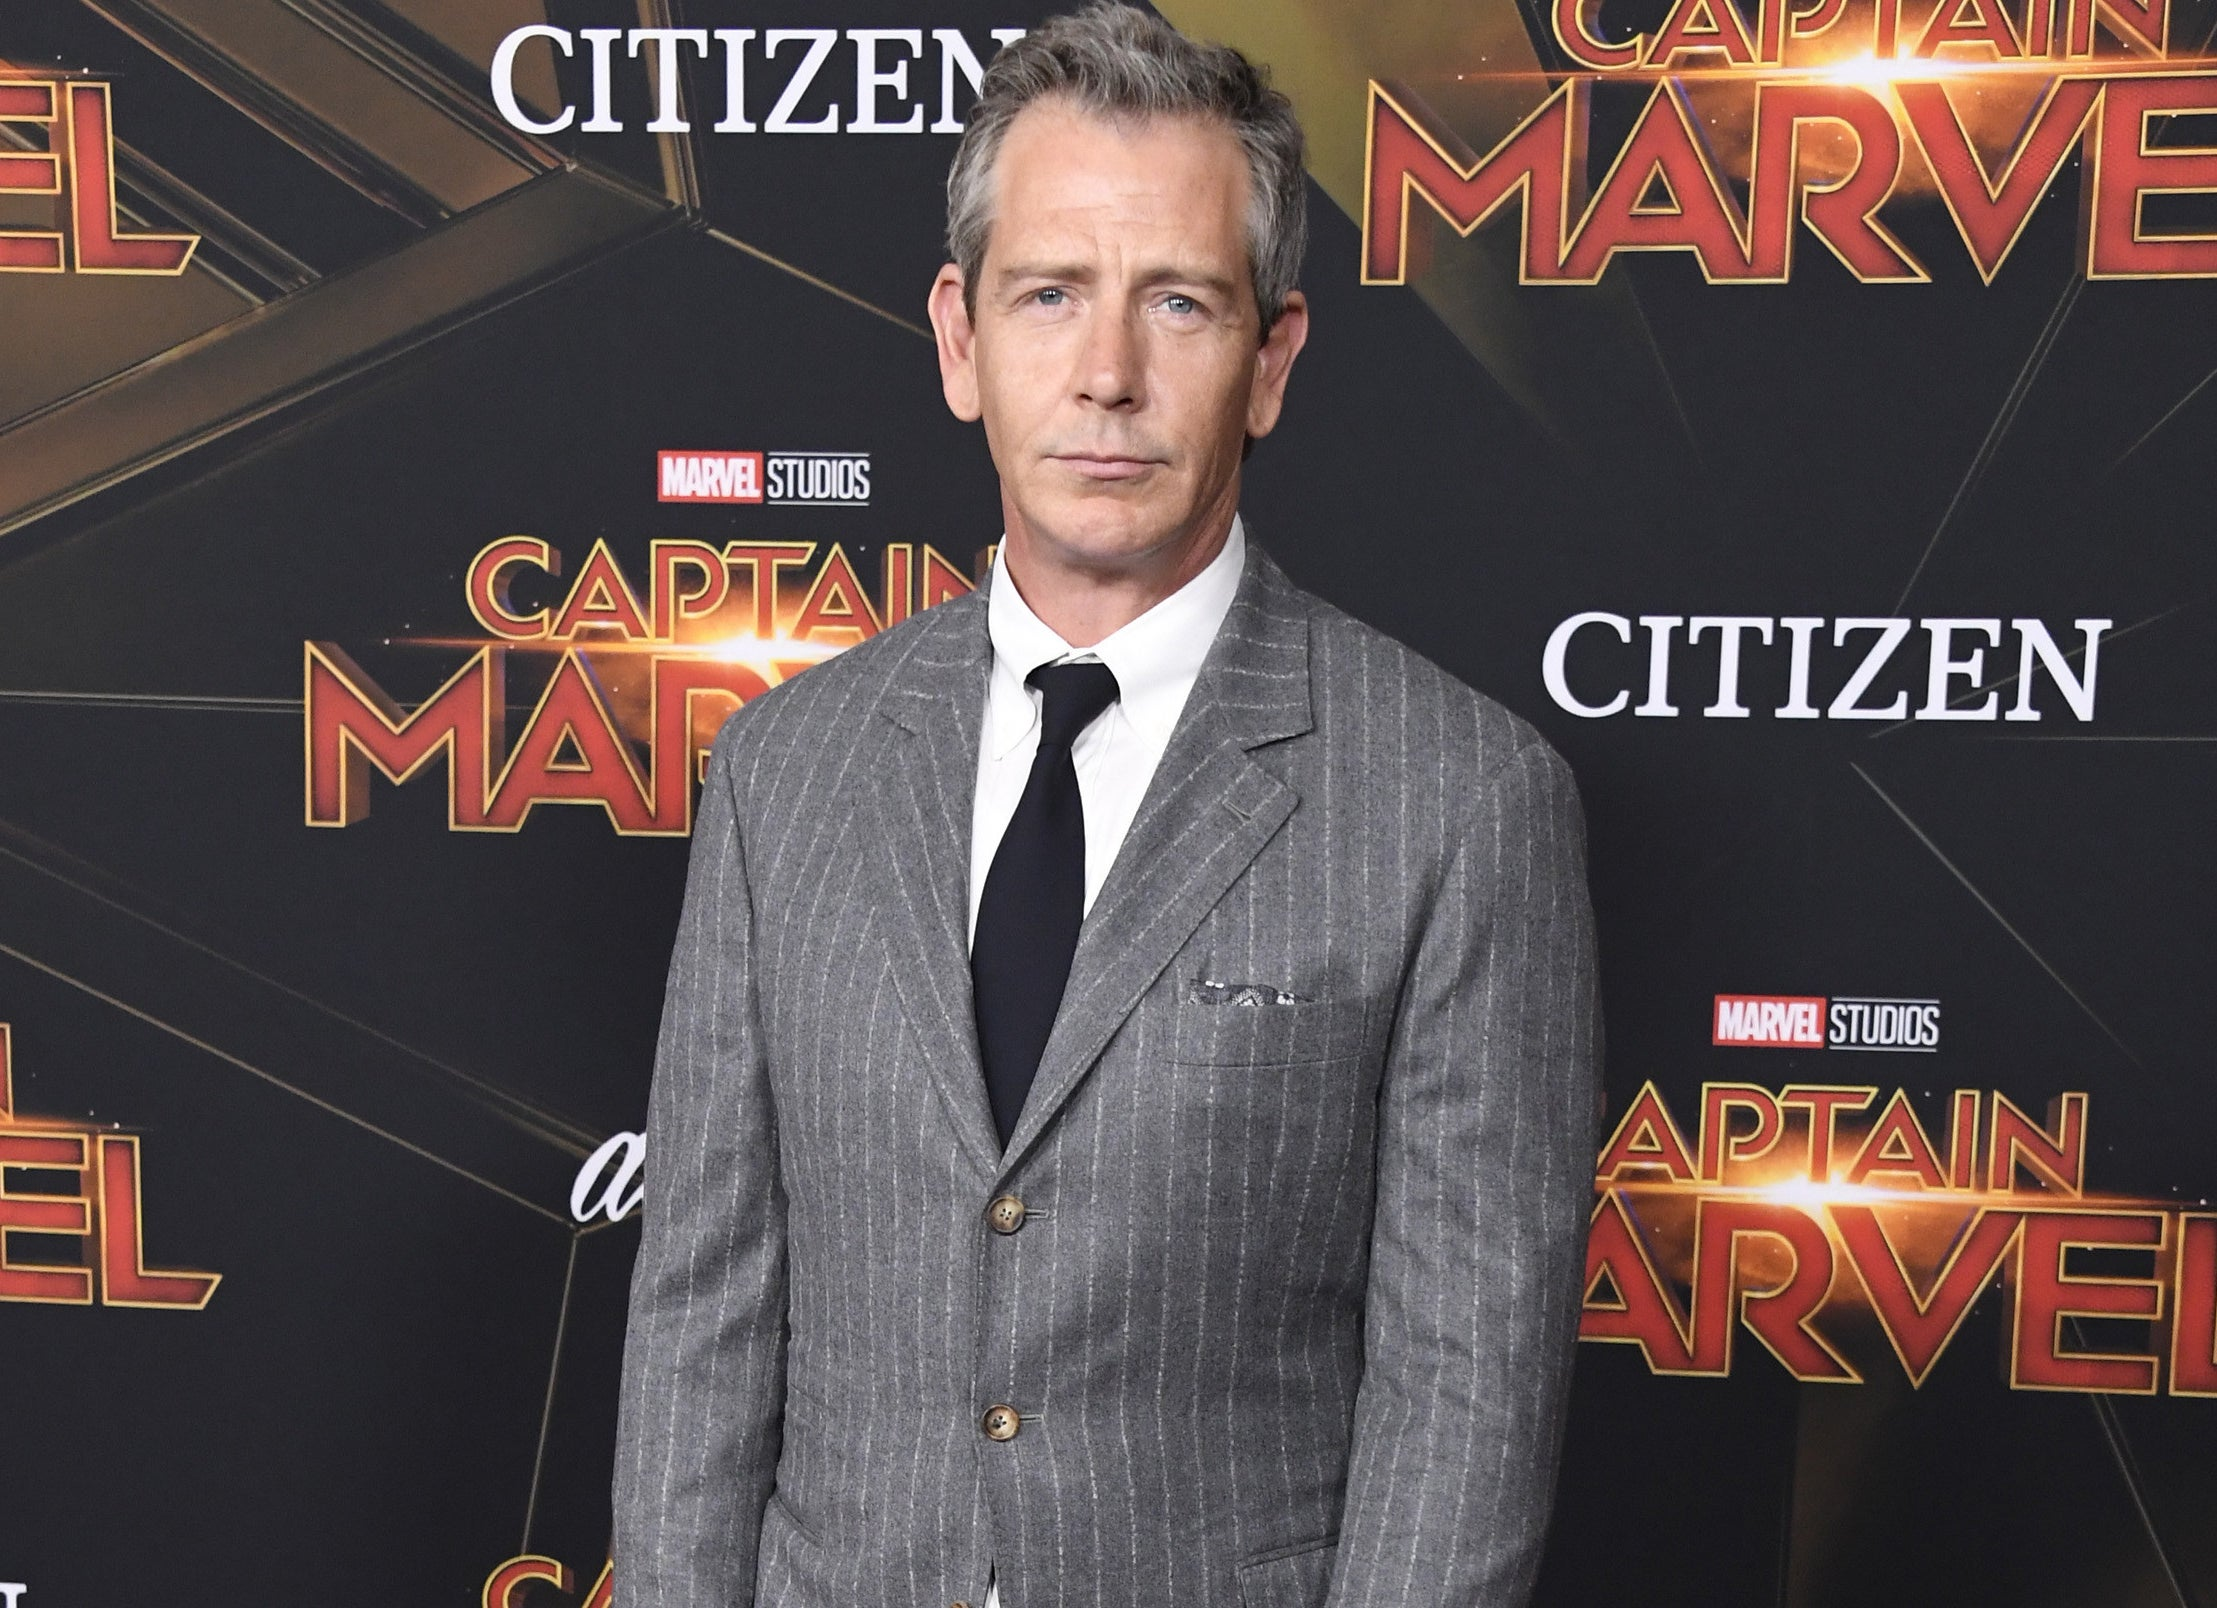 Ben Mendelsohn wears a suit to the Captain Marvel premiere